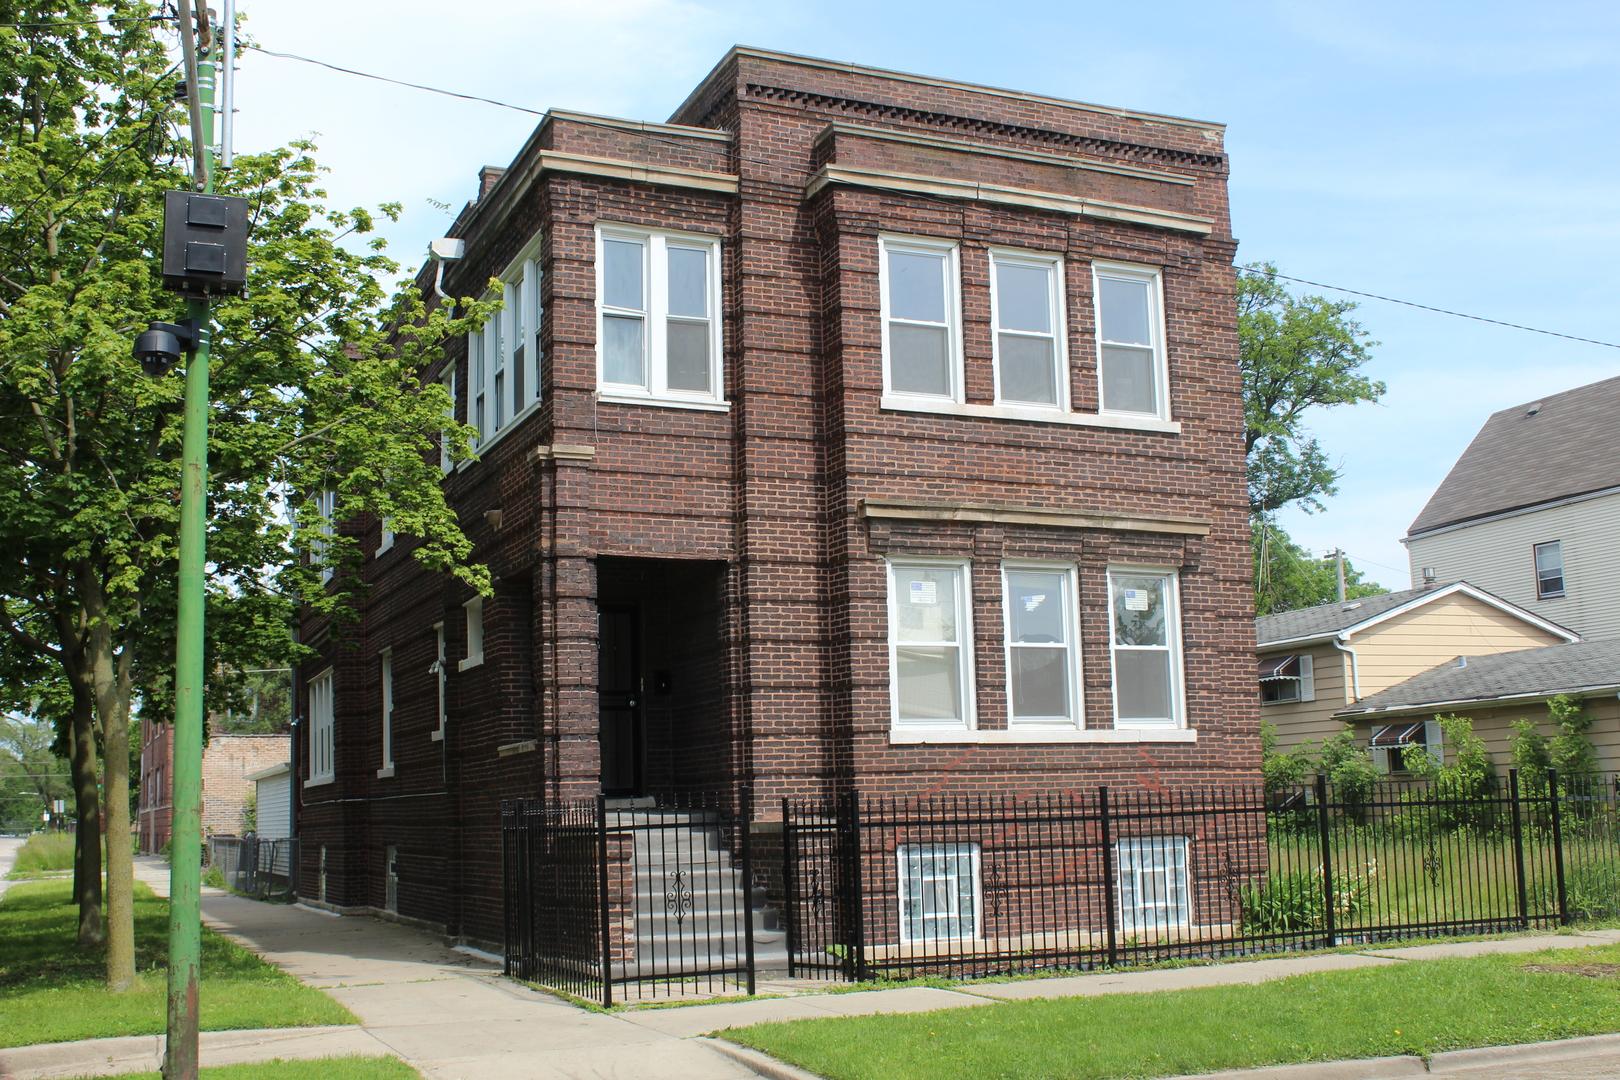 6801 Justine ,Chicago, Illinois 60636